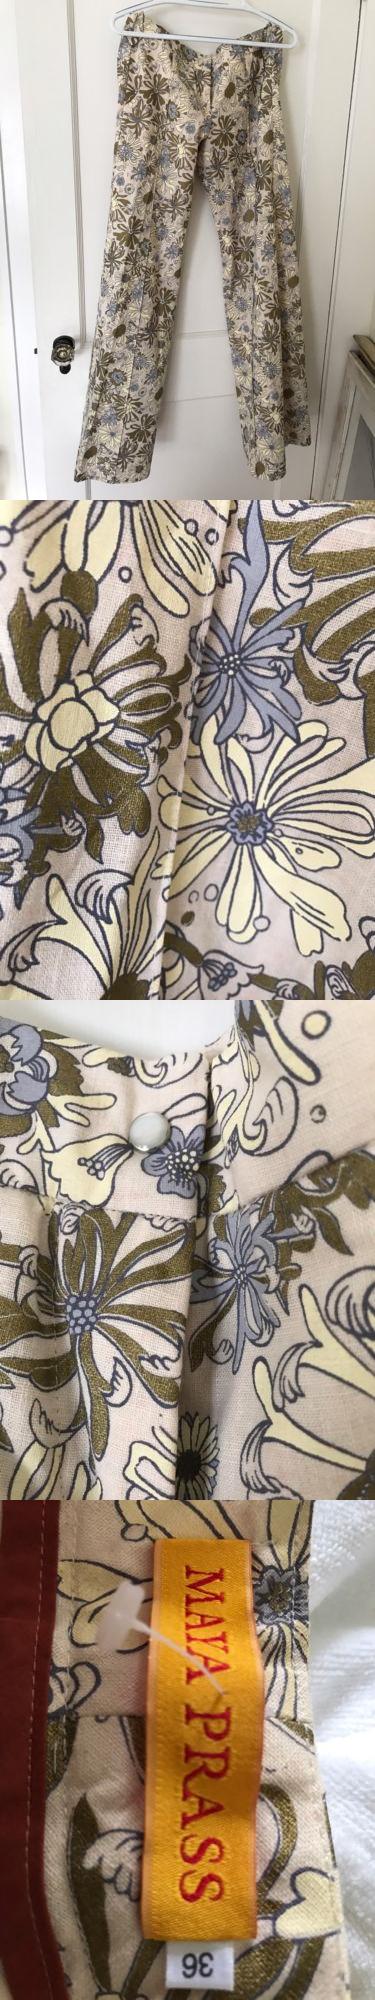 Shirts Tops 50990: Maya Prass Designer Women S Slacks, Size 36, Length 42 From Waistband To Floor -> BUY IT NOW ONLY: $115 on eBay!